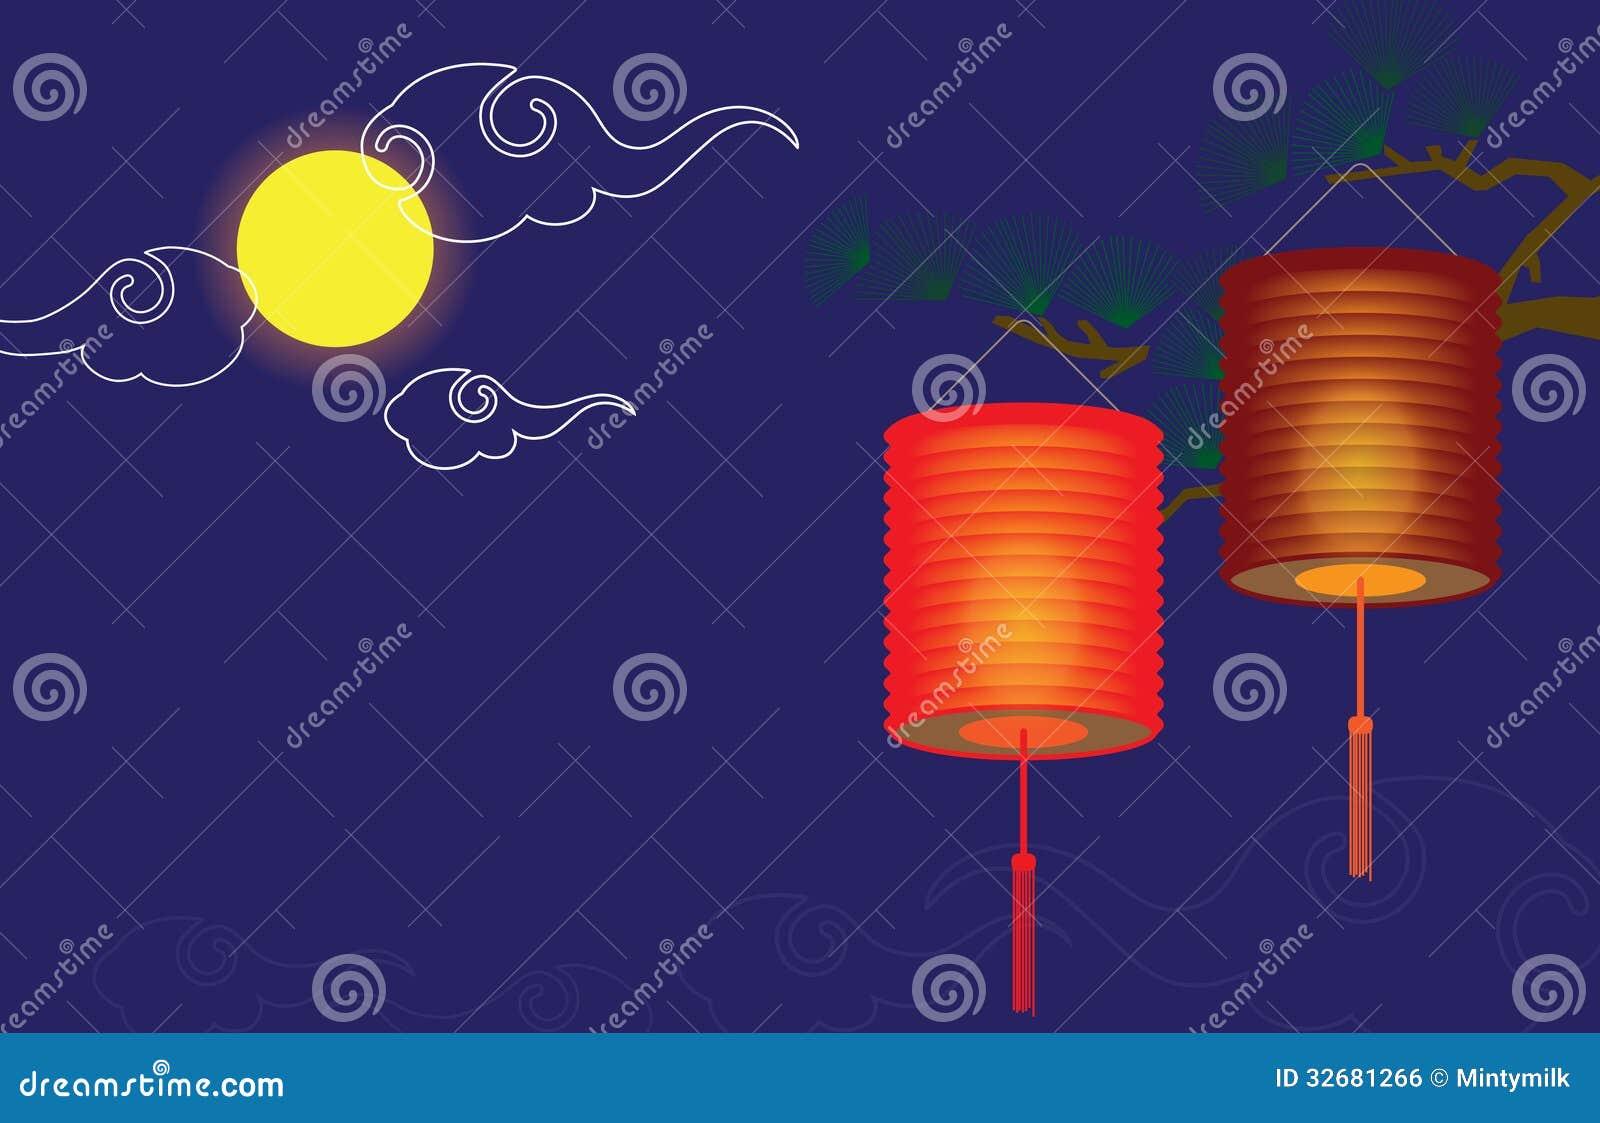 Chinese mid autumn festival stock illustration illustration of chinese mid autumn festival kristyandbryce Choice Image